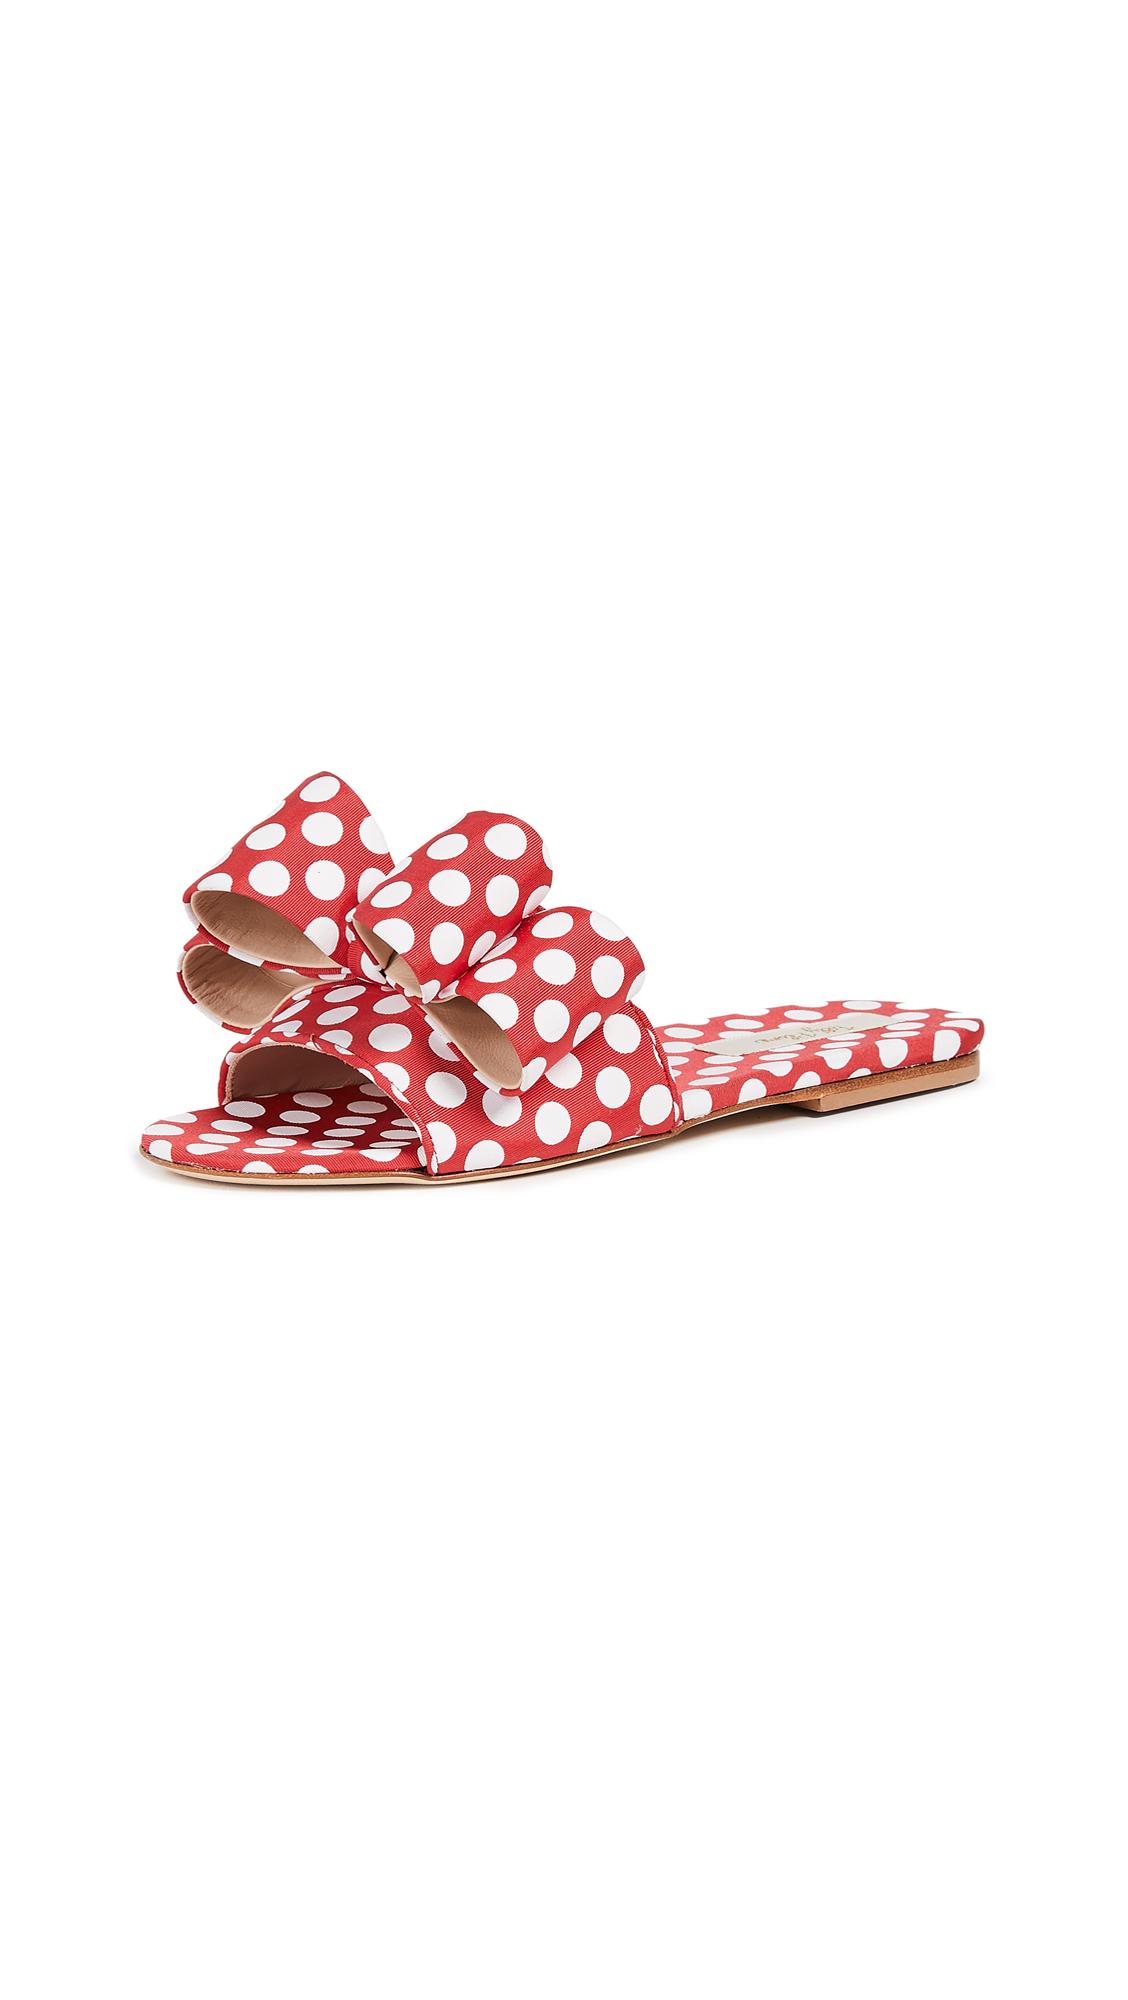 Polly Plume Lola Bow Slides - Cherry